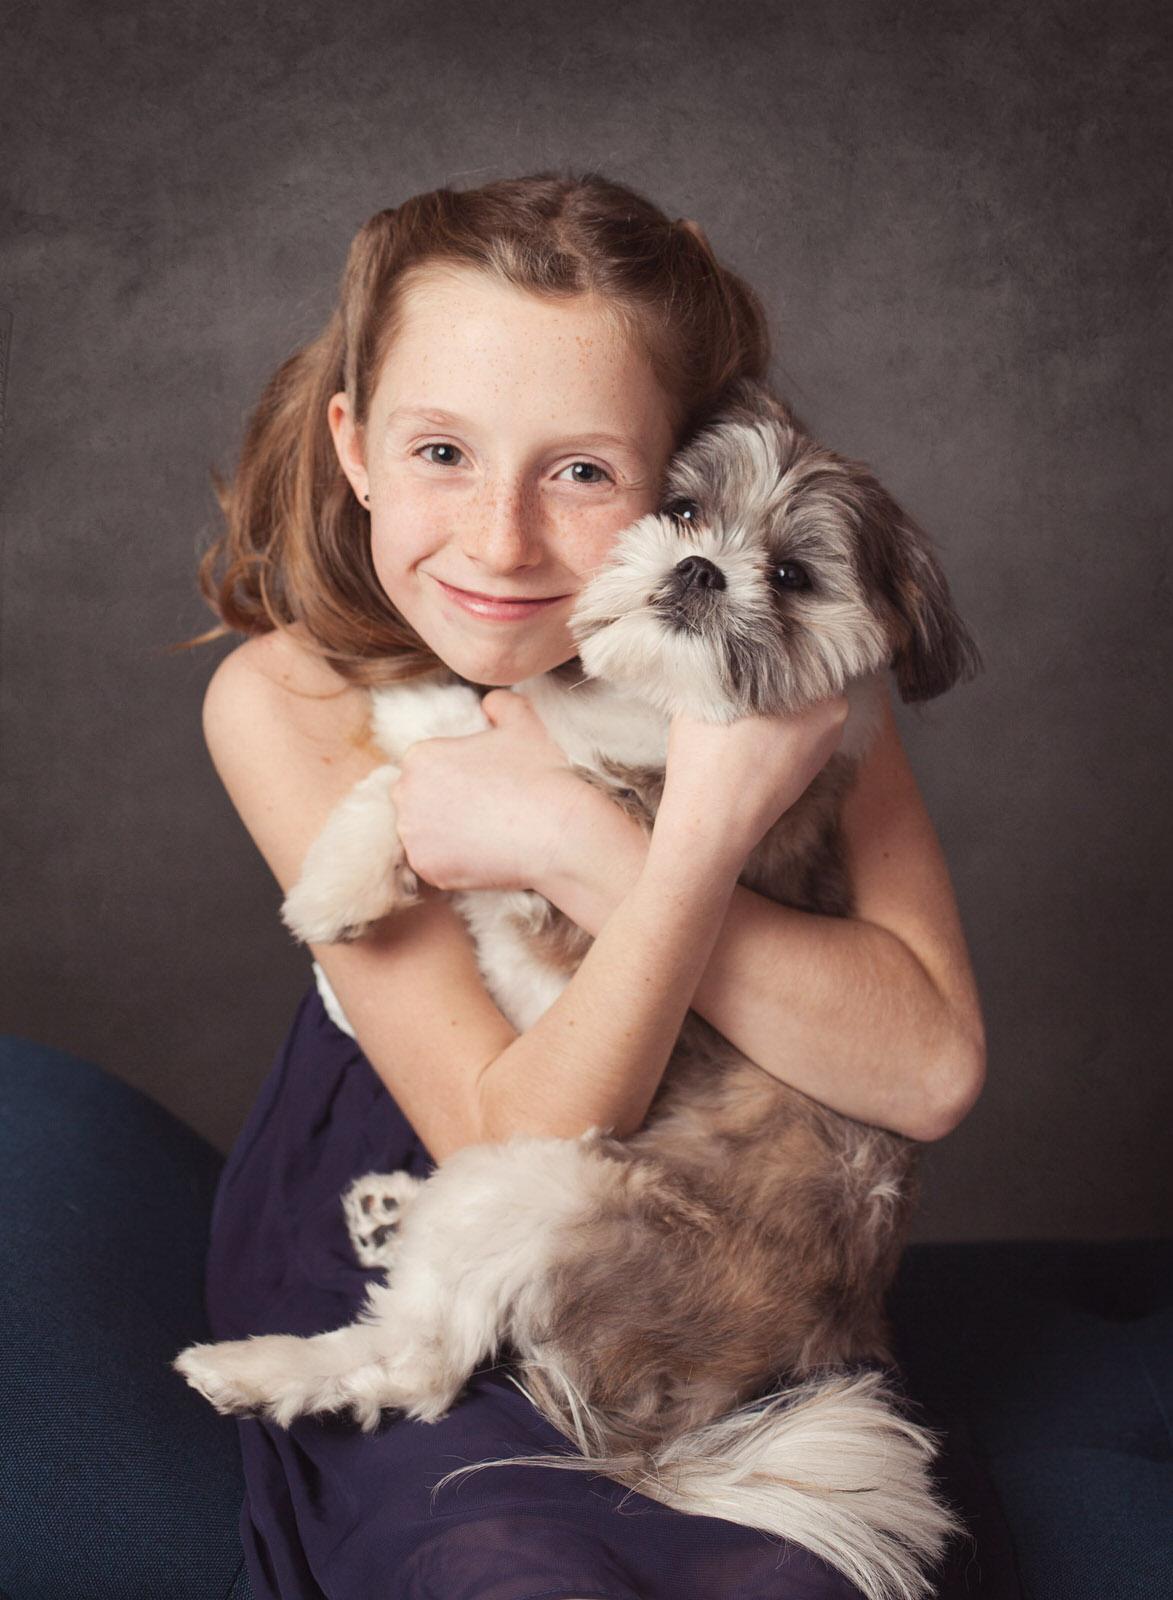 upper-peninsula-photographer-family-children-marquette-michigan-jackie-solomon-011.jpg